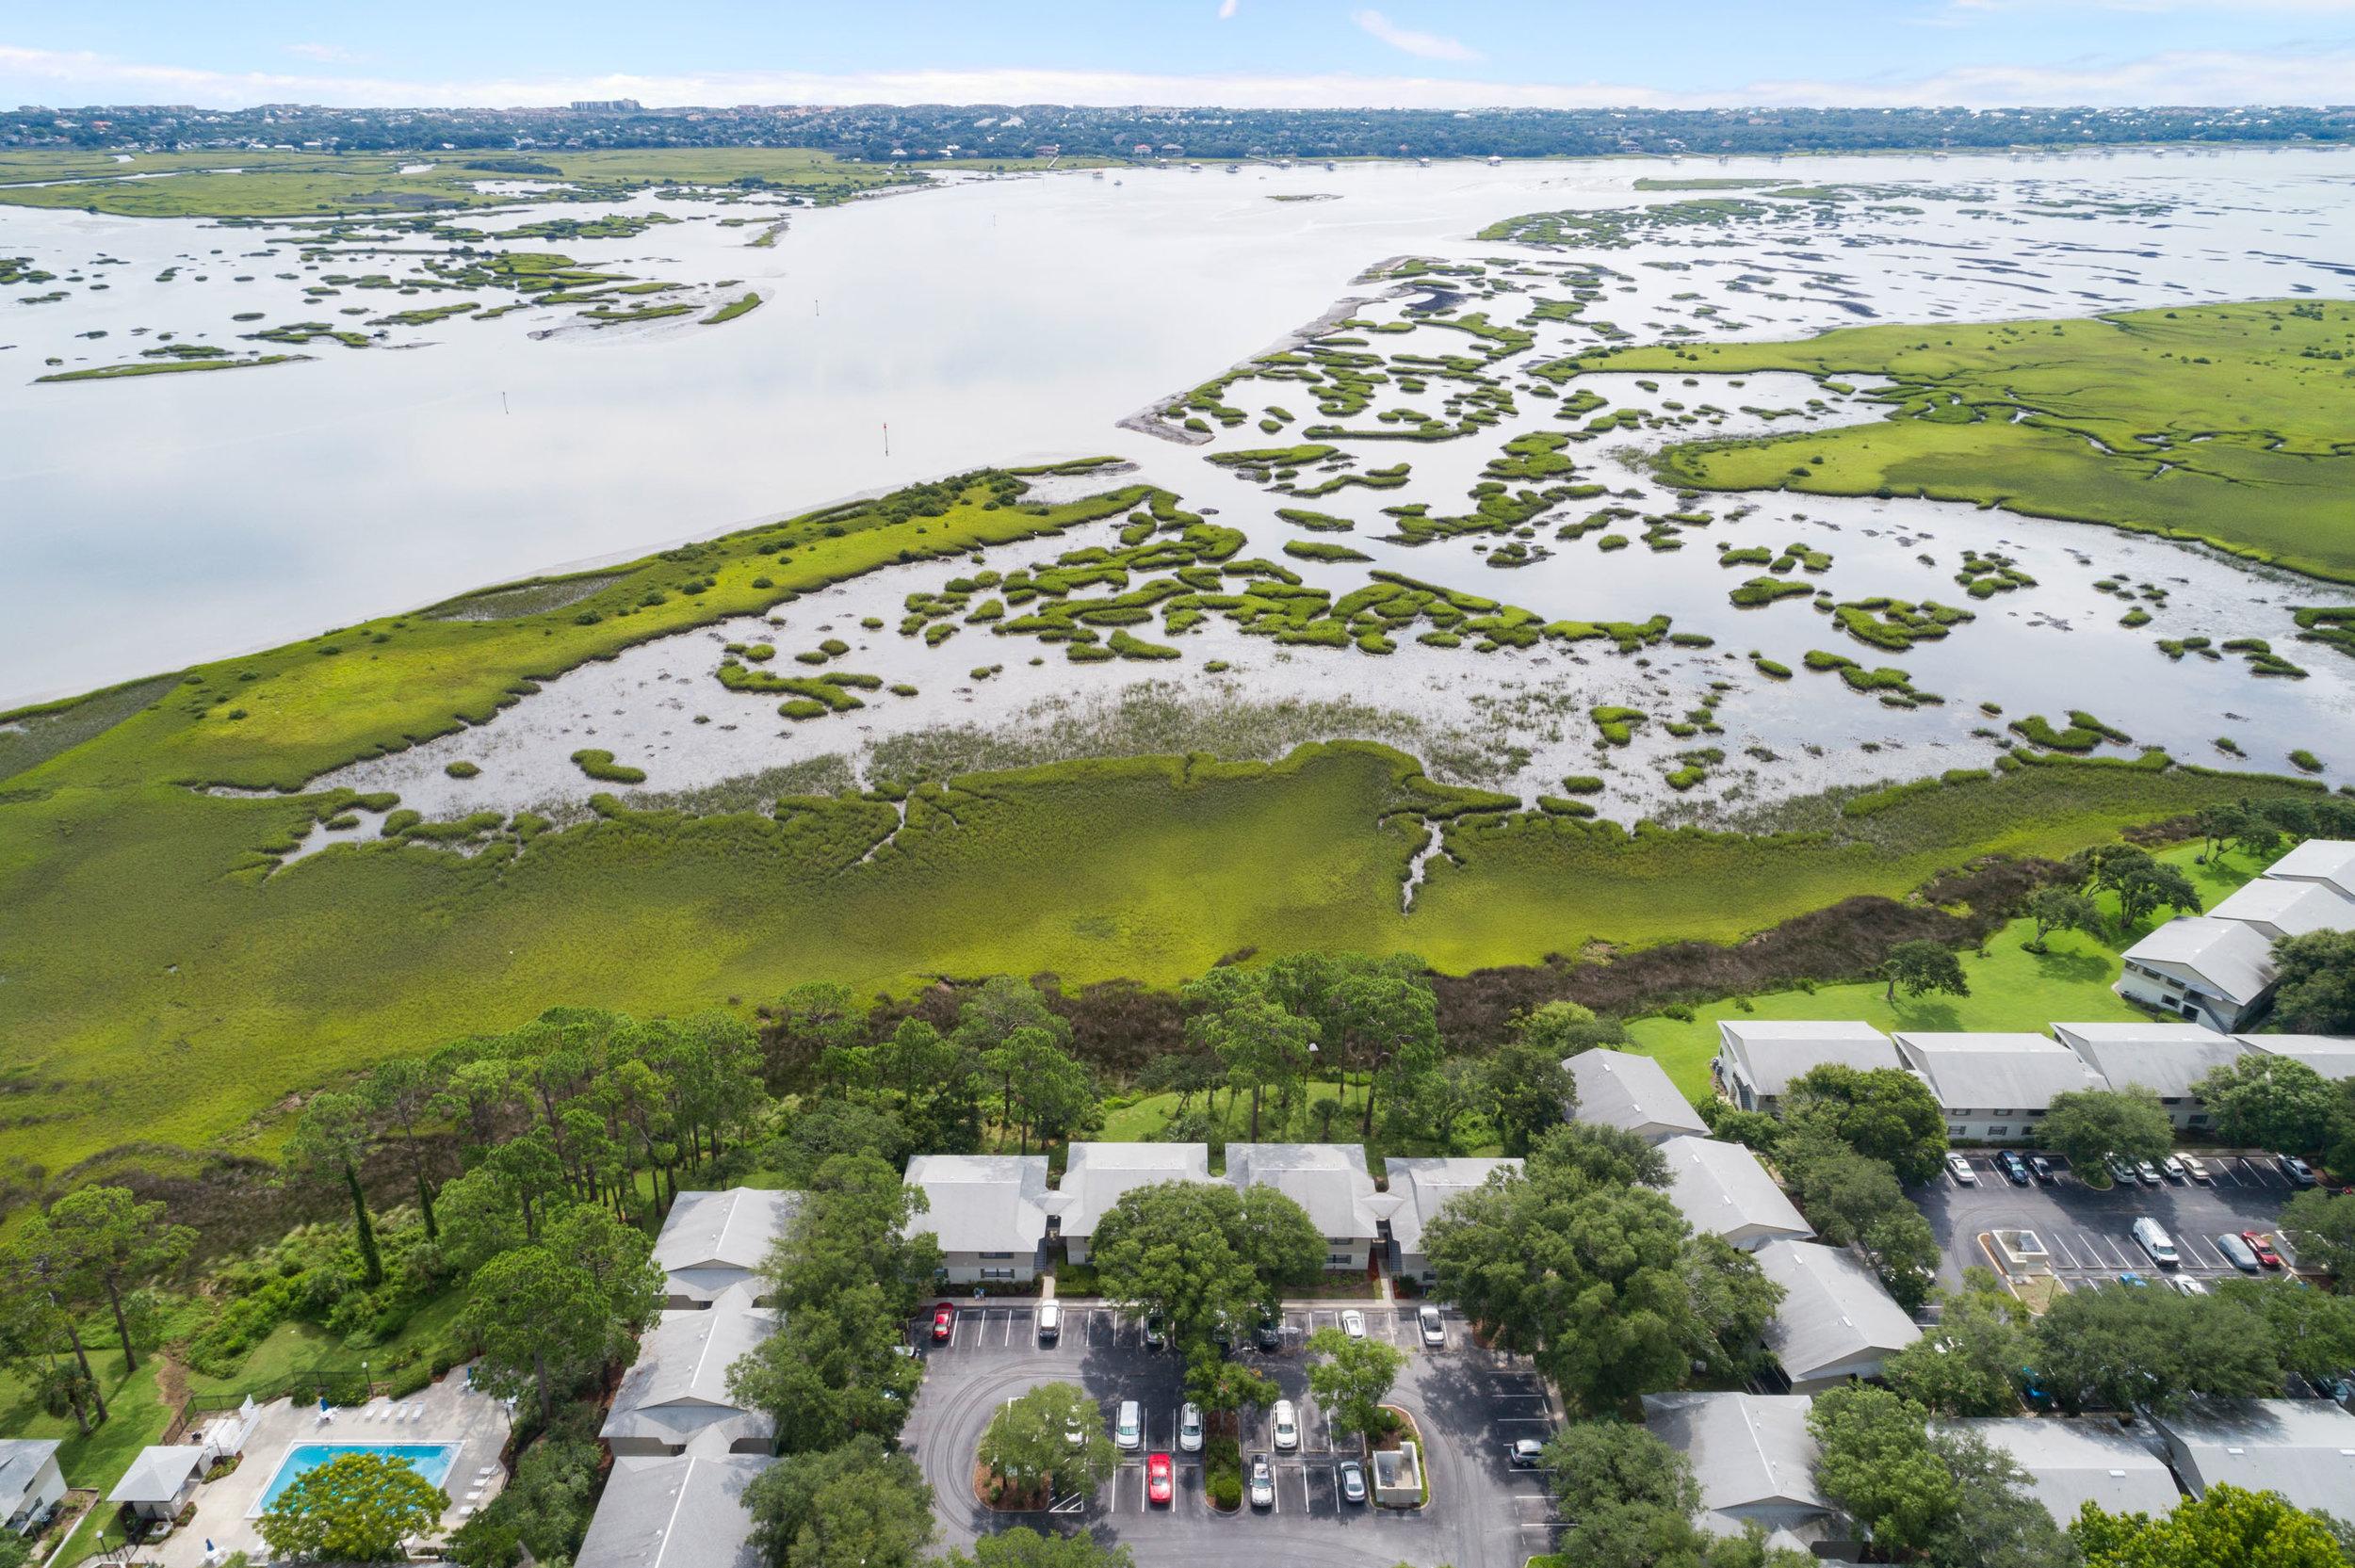 Saint Augustine Drone Photographer Aerial Video-001-7.jpg